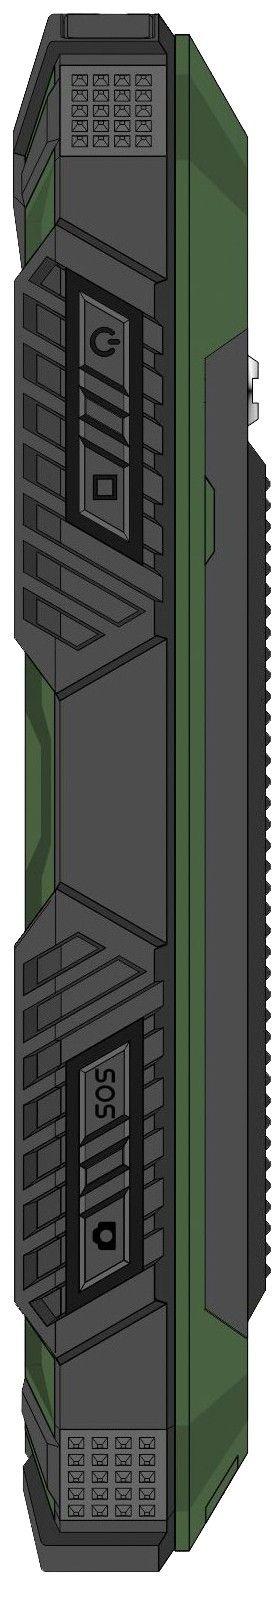 Мобильный телефон Sigma mobile X-treme PQ15 Green - 3